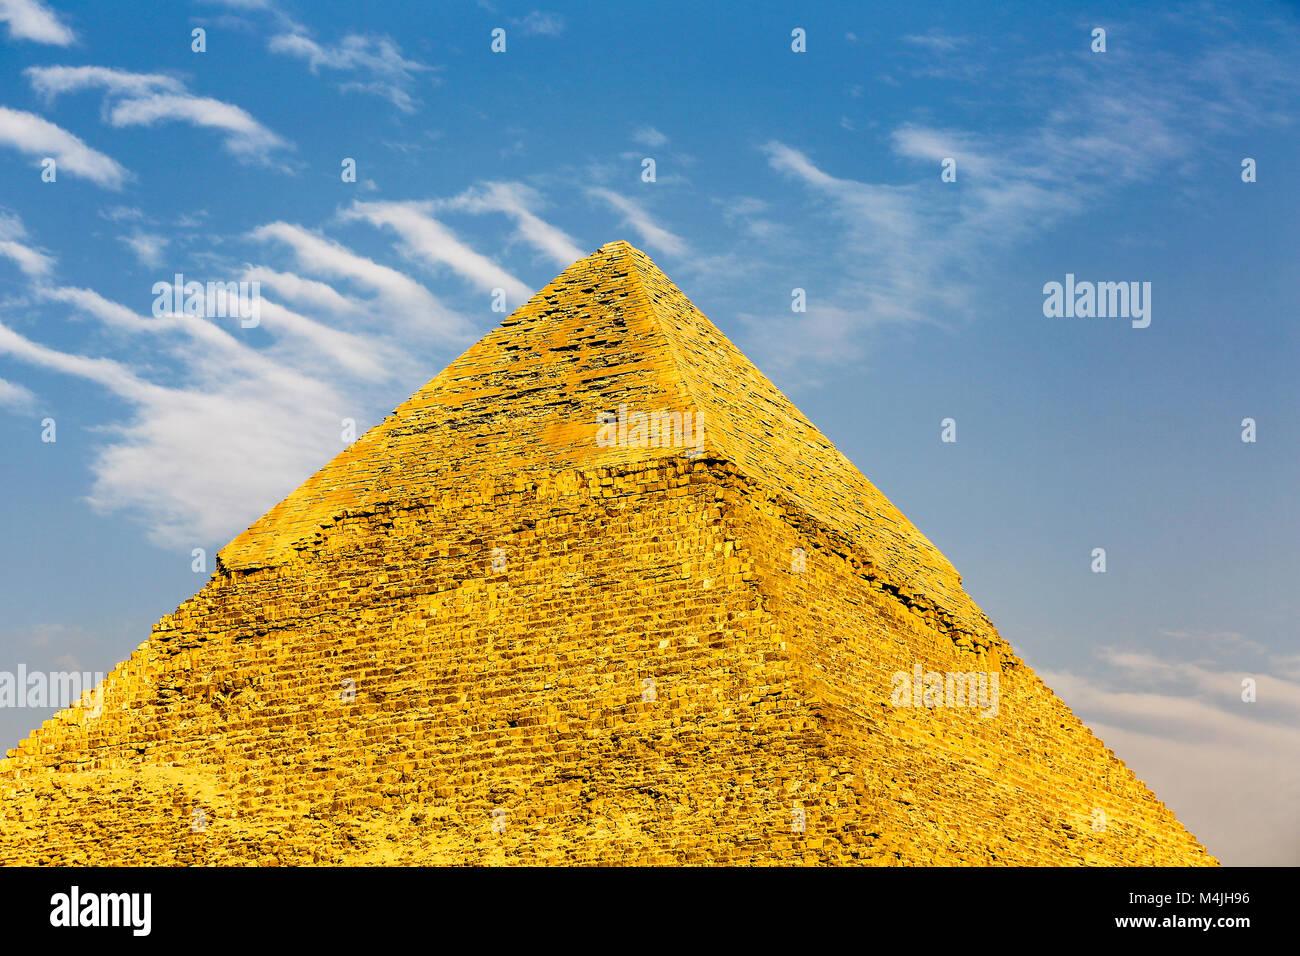 pyramids-giza-egypt-north-africa-M4JH96.